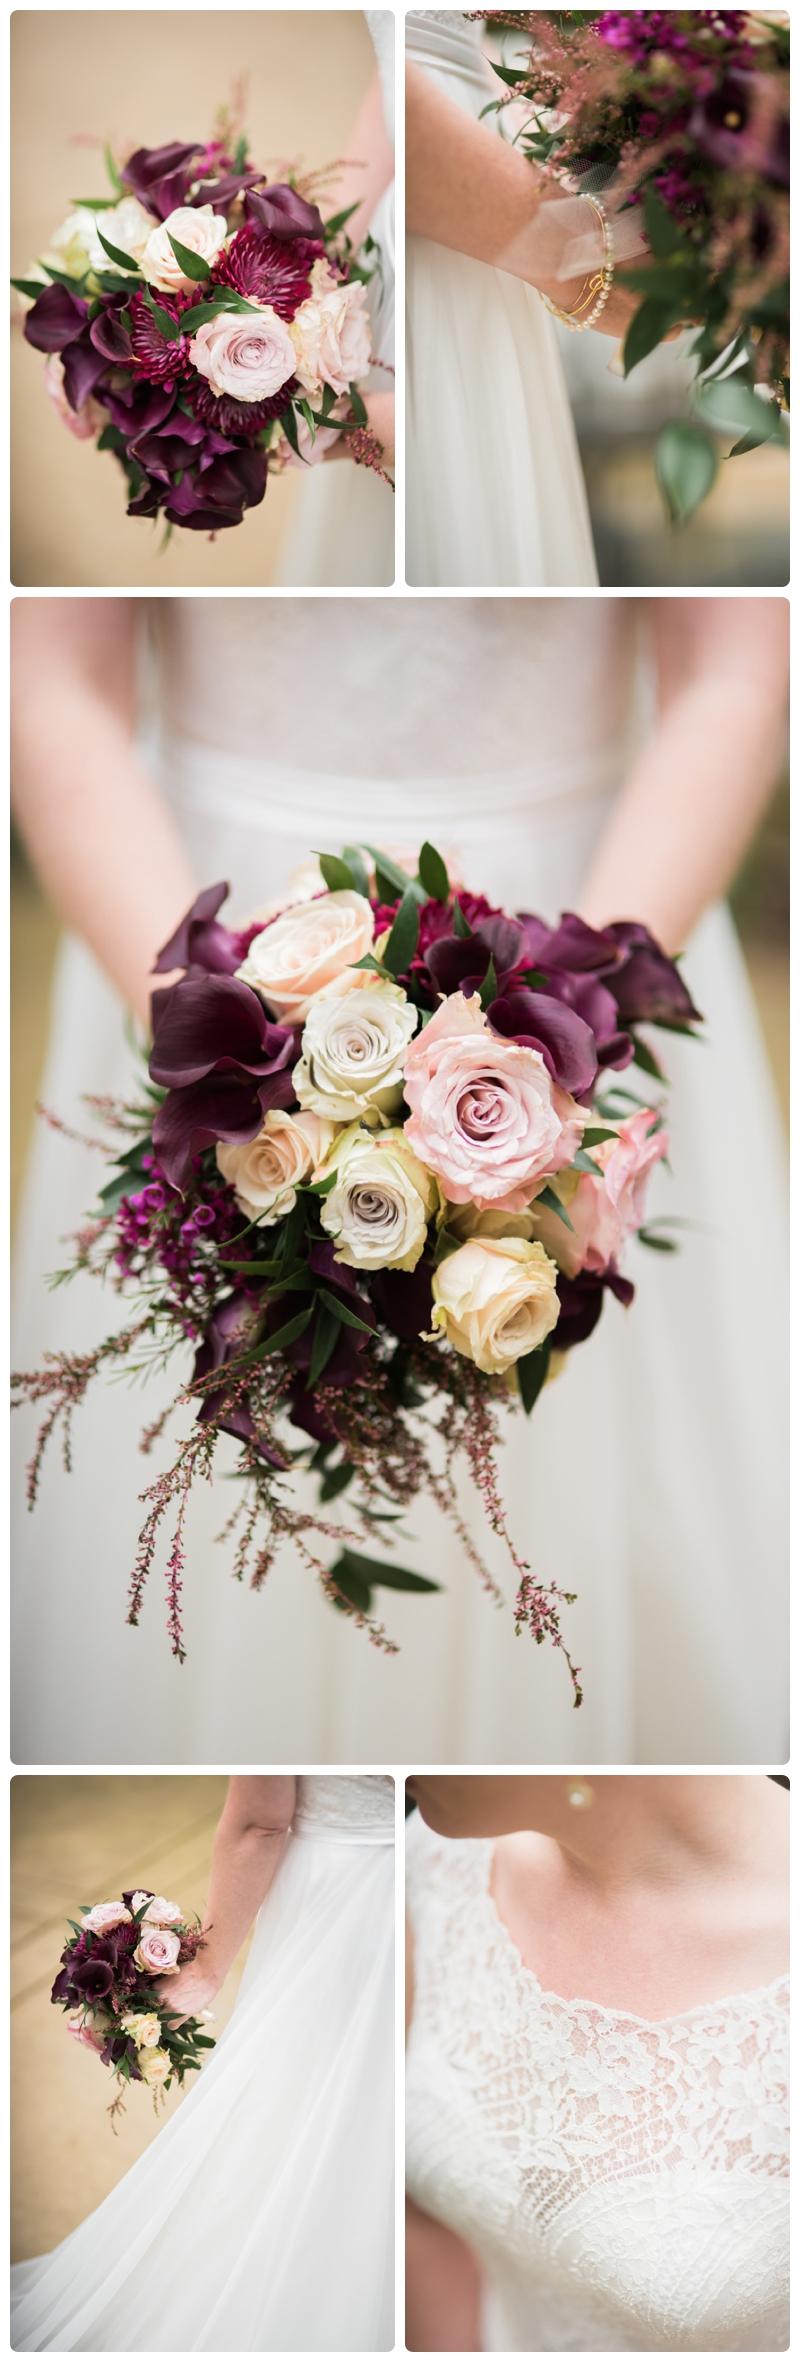 Wedding in Falls Church Virginia by Rachael Foster Photography_0015.jpg